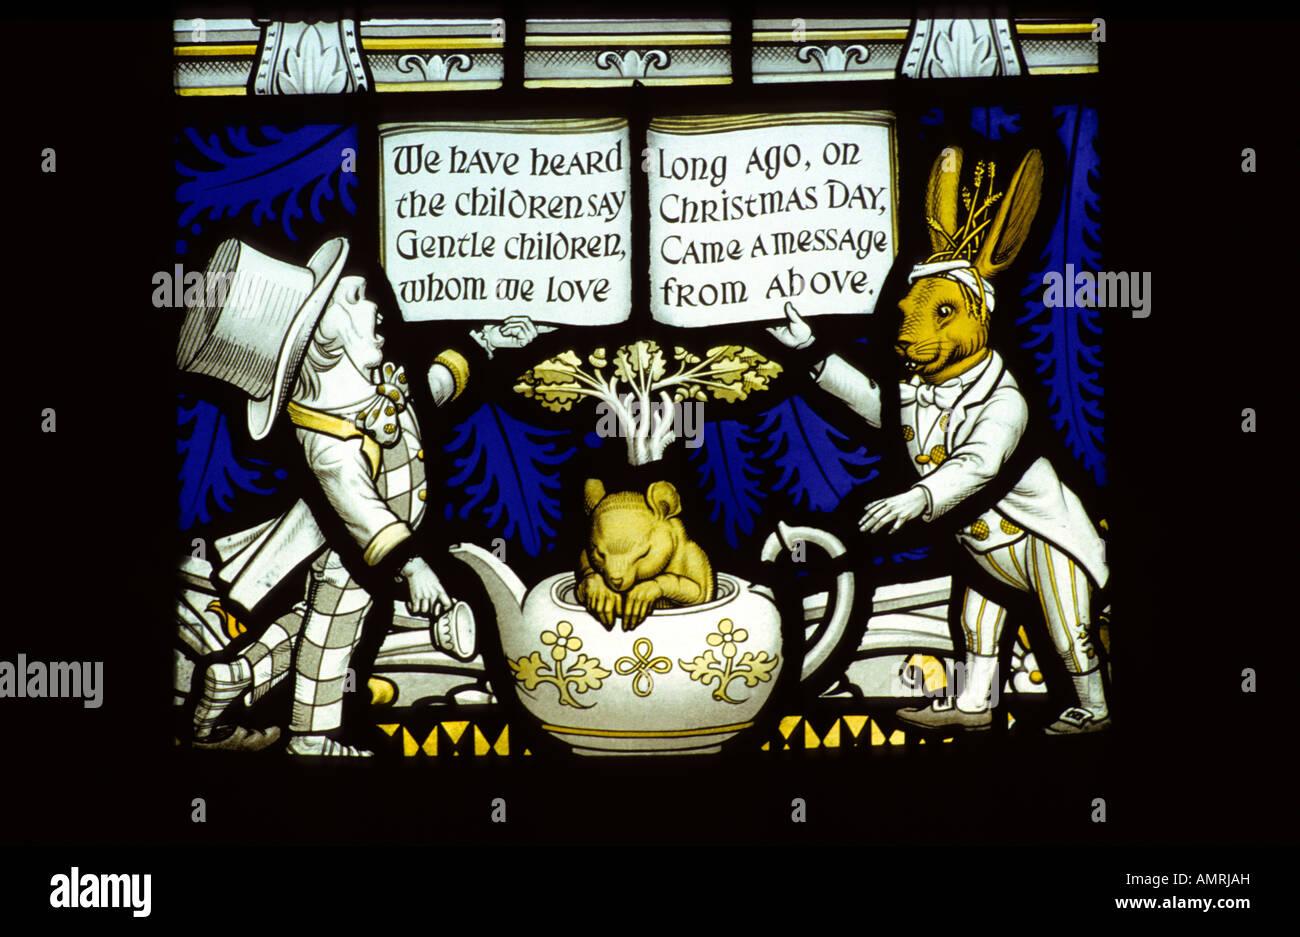 Lewis Carroll stained glass memorial window #3, Daresbury church, Cheshire, UK. - Stock Image